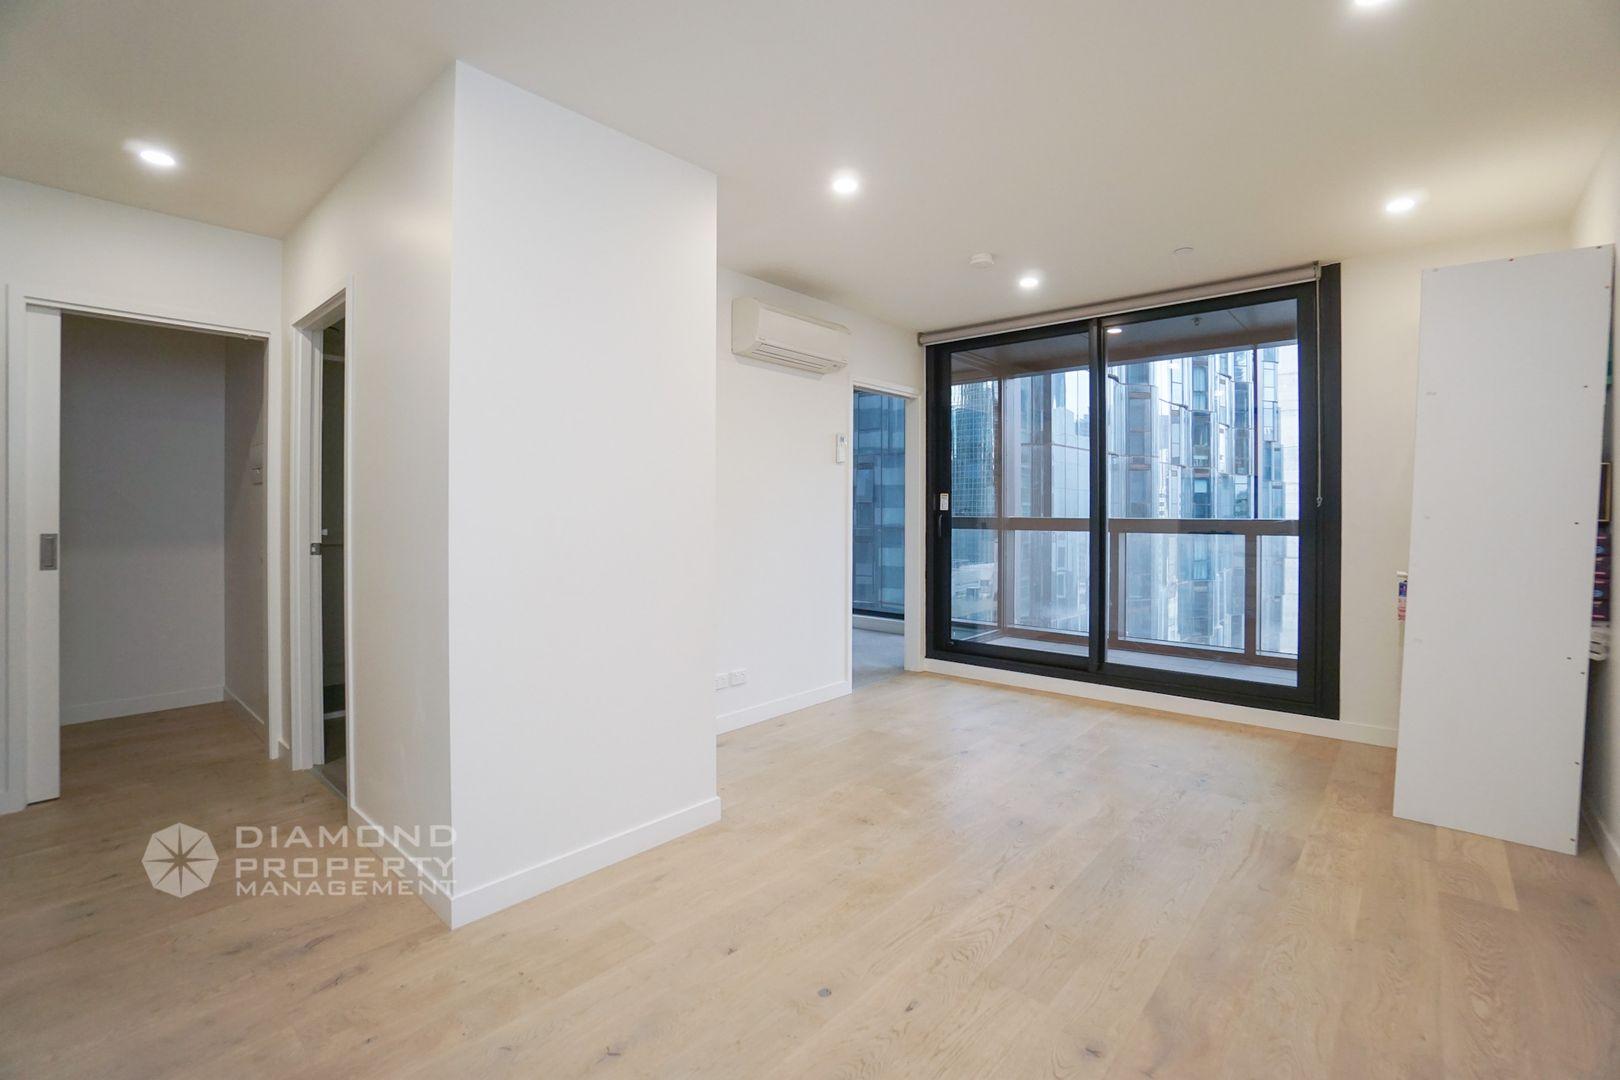 1 bedrooms Apartment / Unit / Flat in 1801/296 Little Lonsdale Street MELBOURNE VIC, 3000